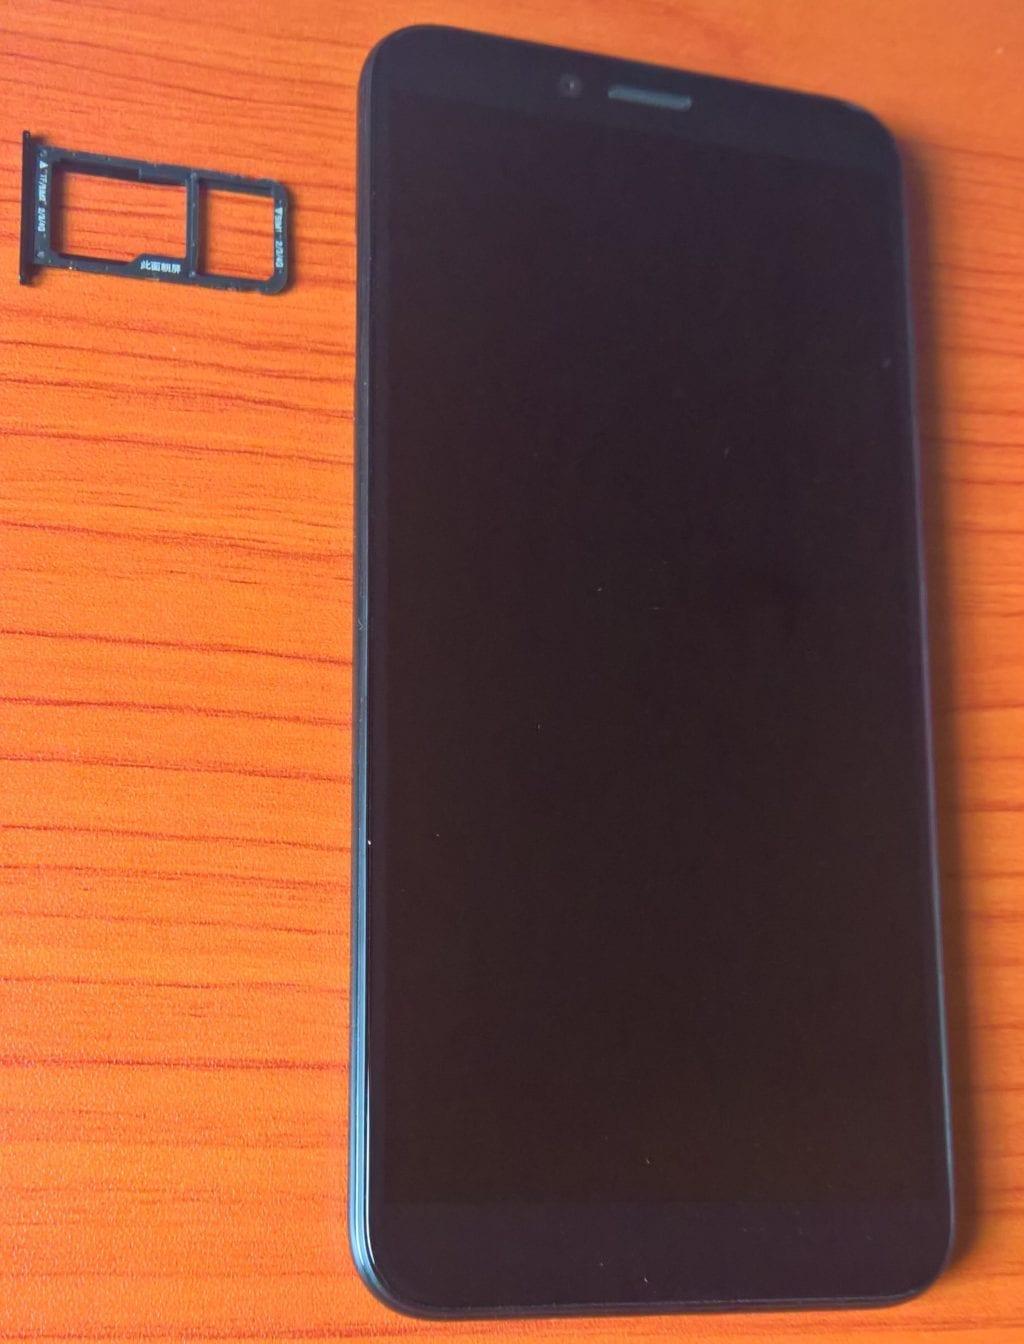 Lenovo K5 Play SIM Tray for SIM and memory card